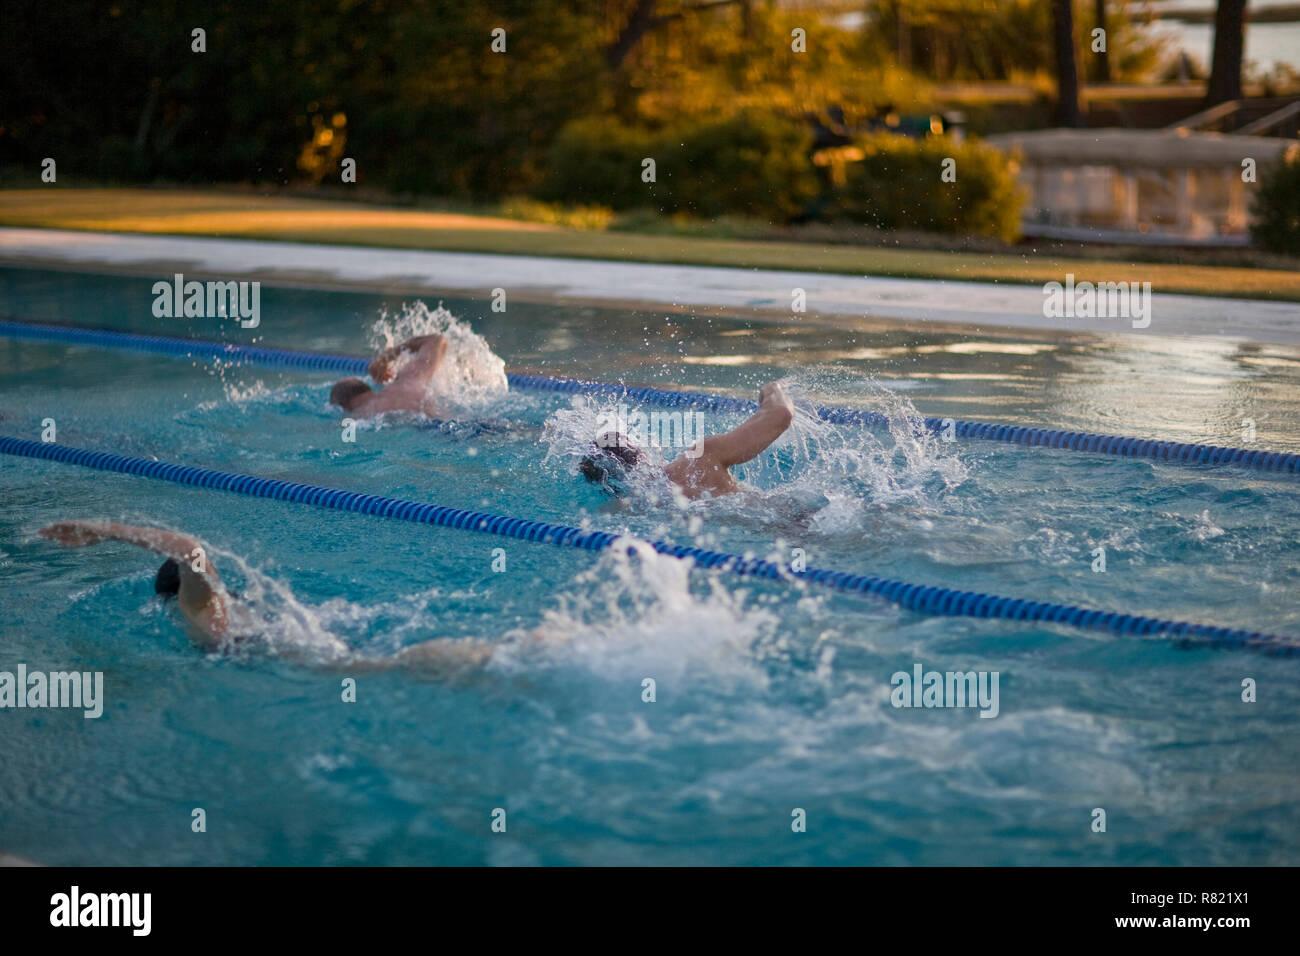 Swimming race - Stock Image